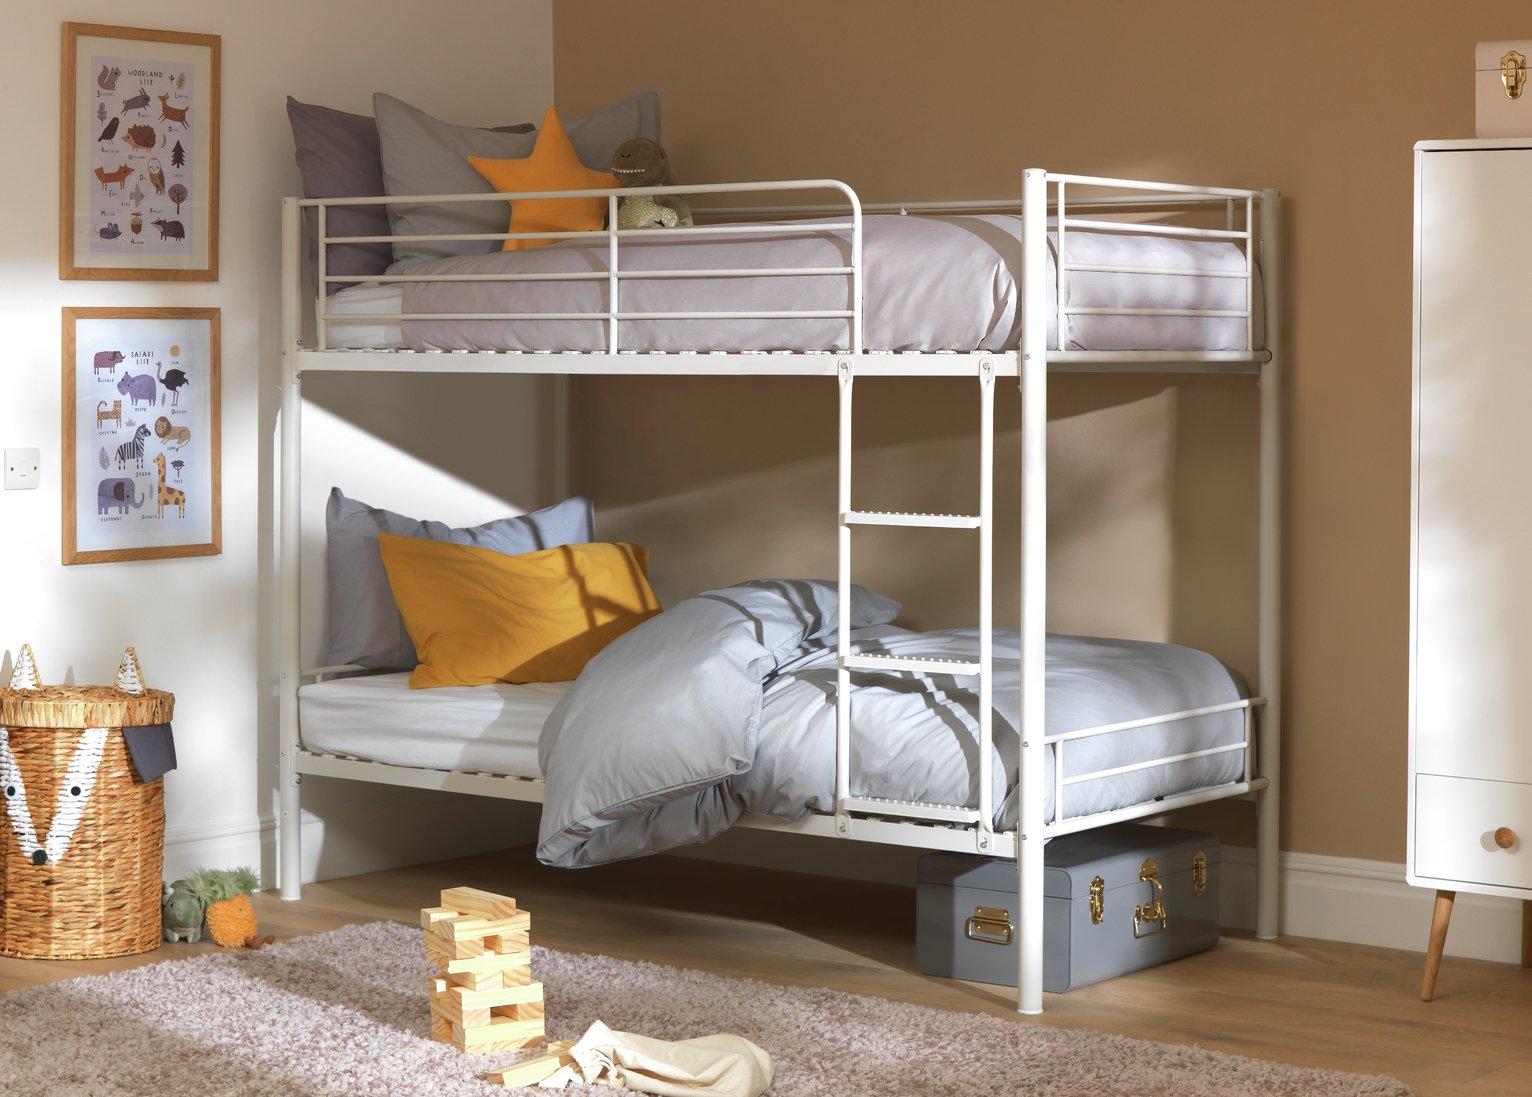 Argos Home Mason Metal Bunk Bed Frame - White